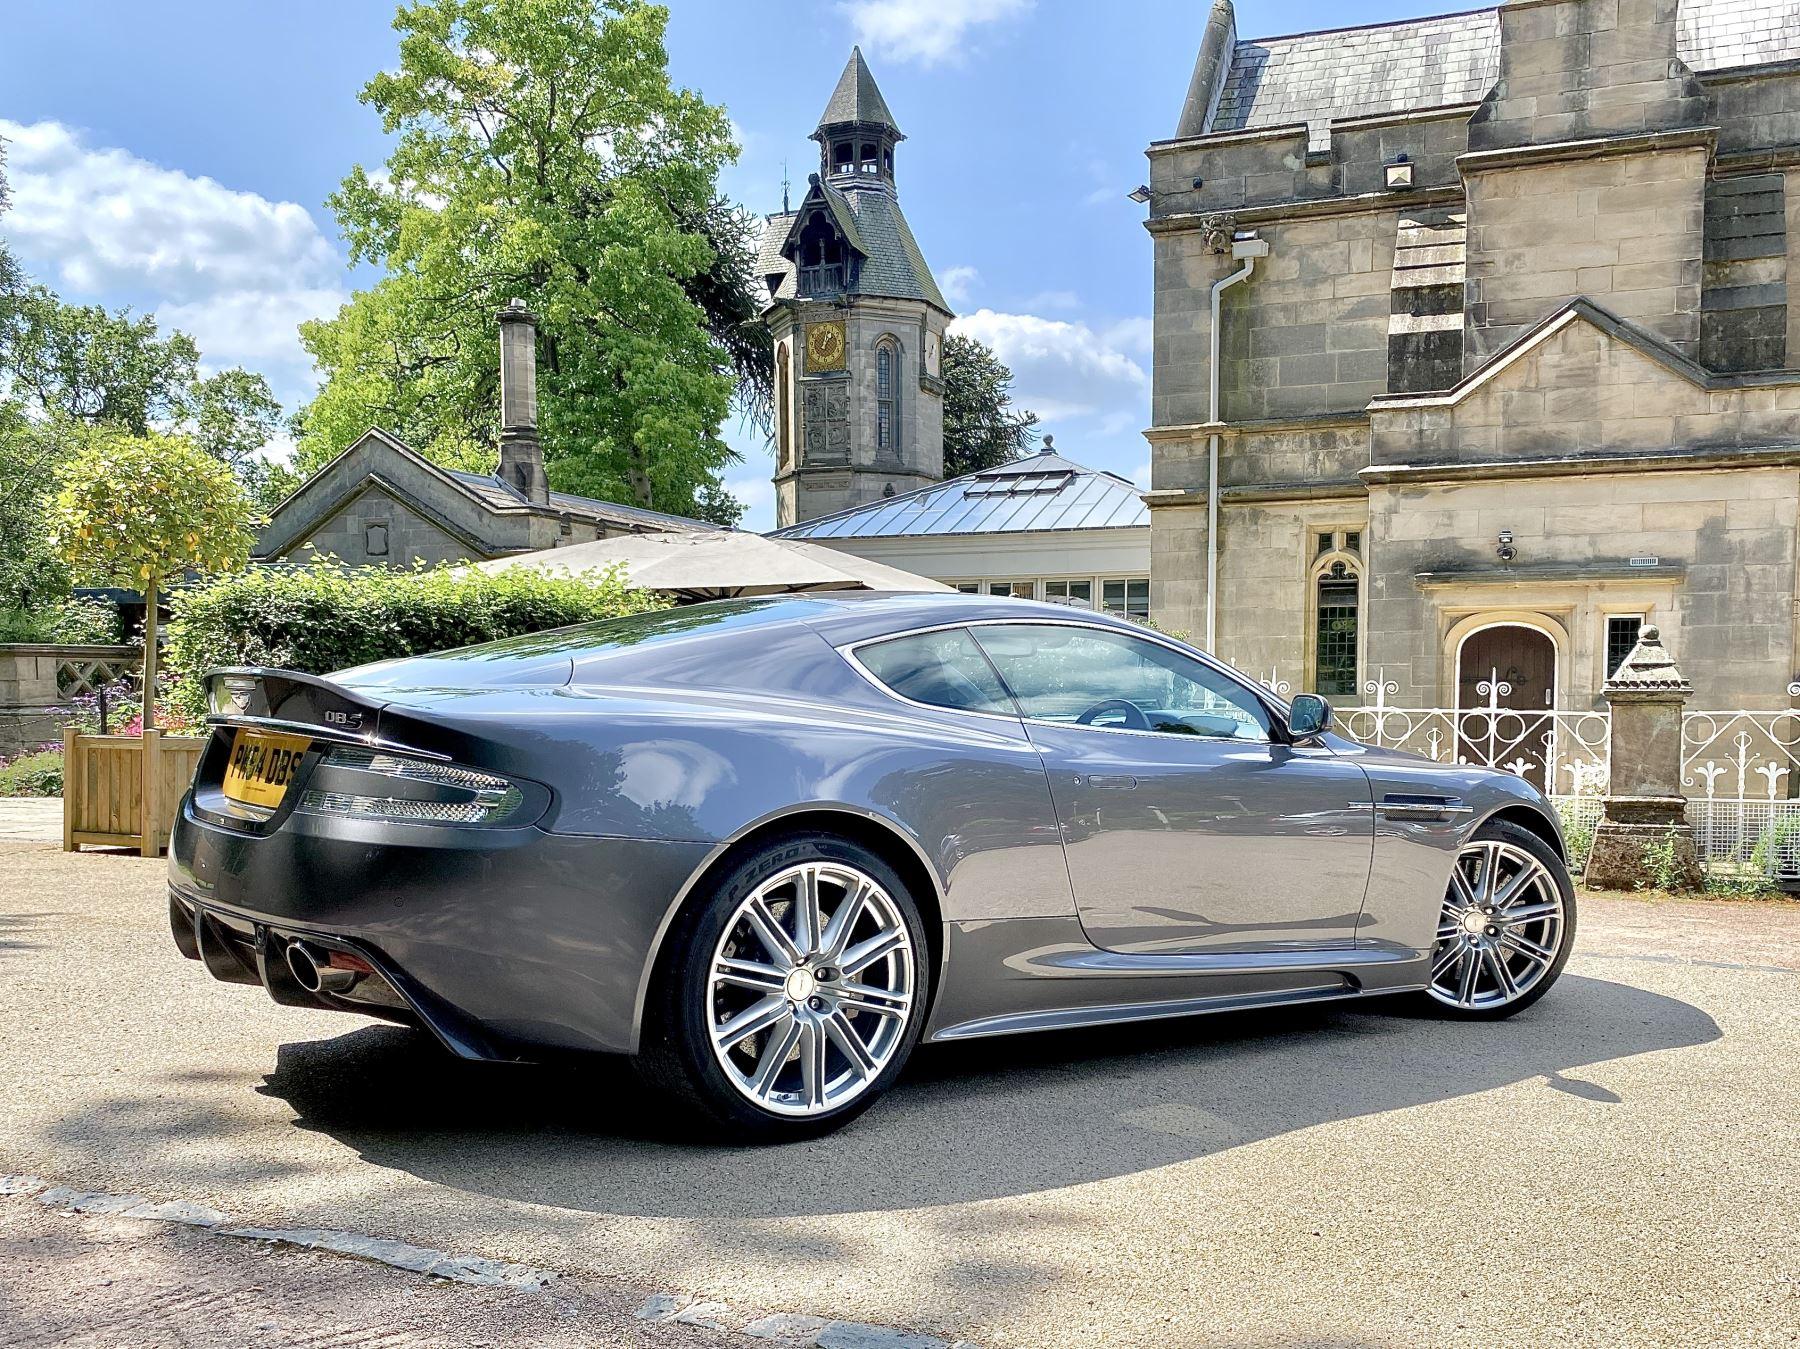 Aston Martin DBS V12 2dr image 7